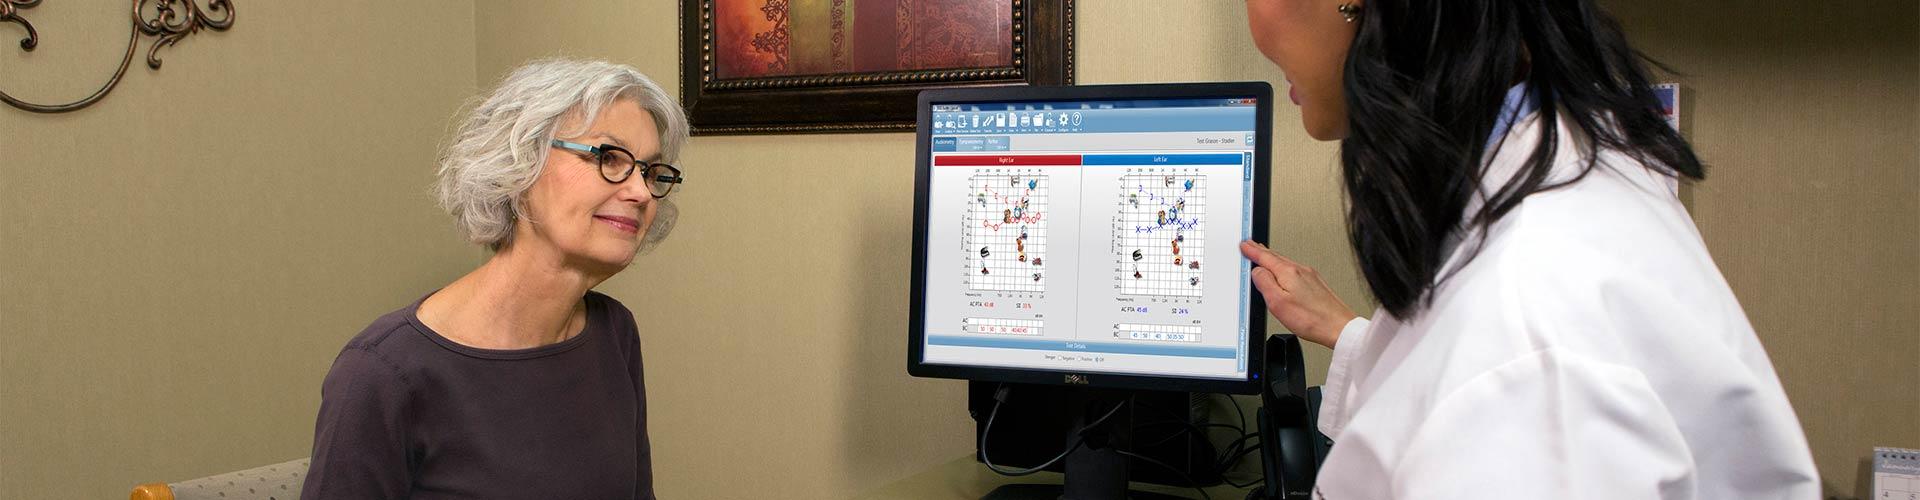 Audiologist Counseling Patient GSI Suite Data